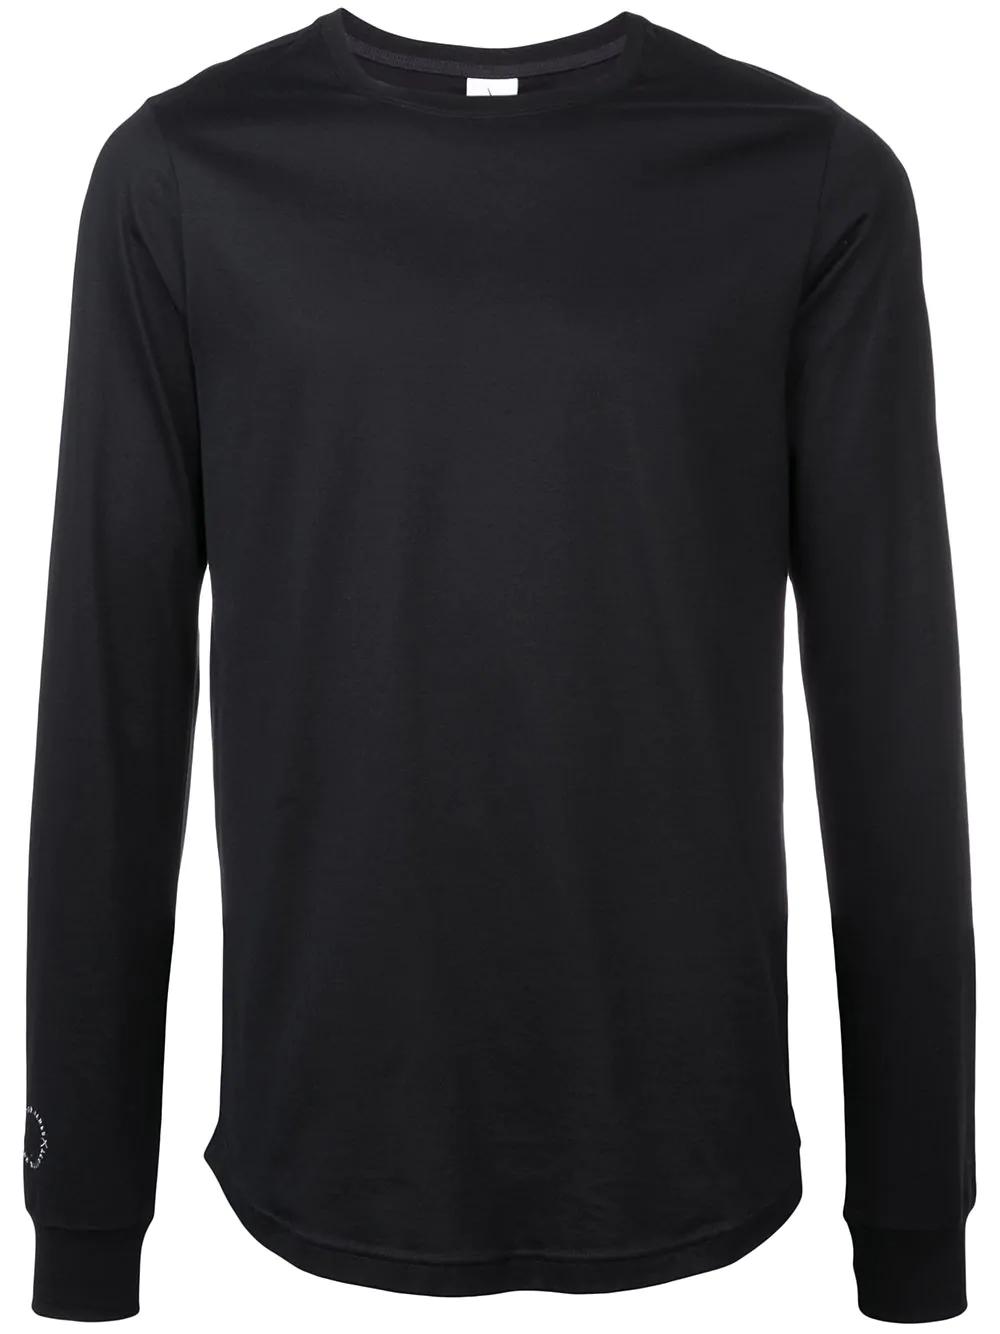 Nike Lebron James X John Elliott Long Sleeve Top In Black